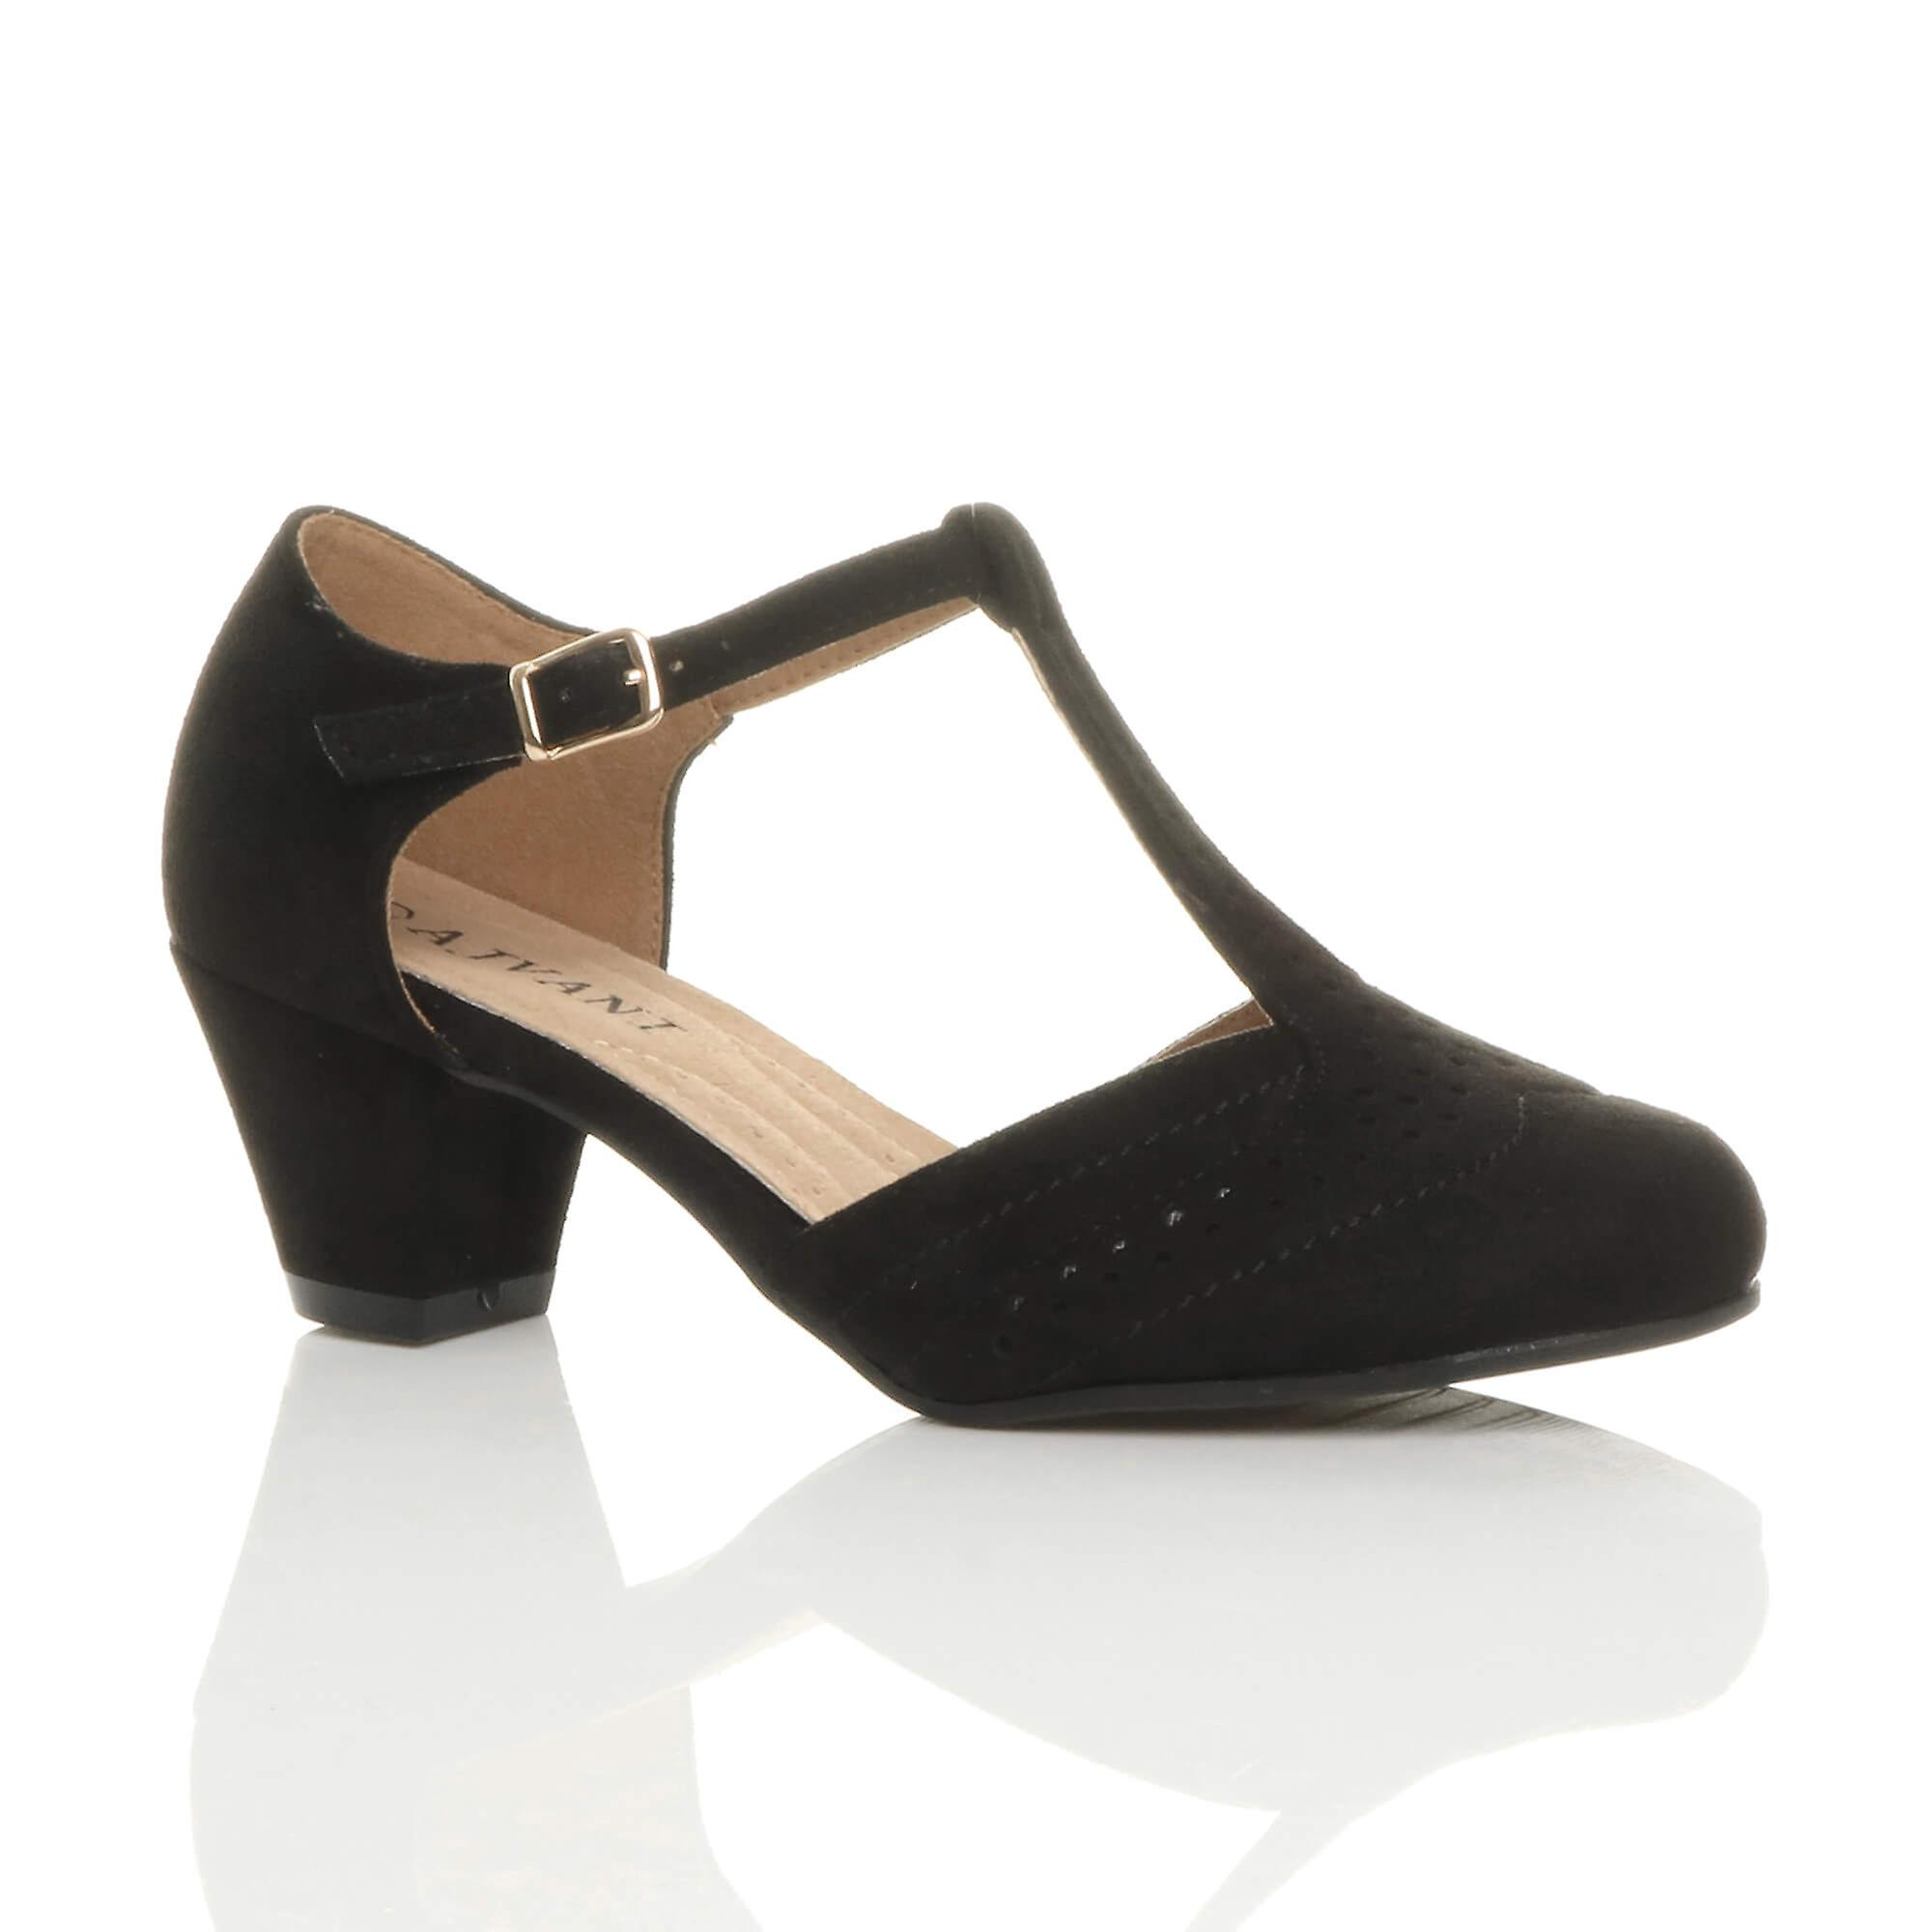 Ajvani womens mid low block heel t-bar brogue comfort rubber sole court shoes sandals dl4Nc